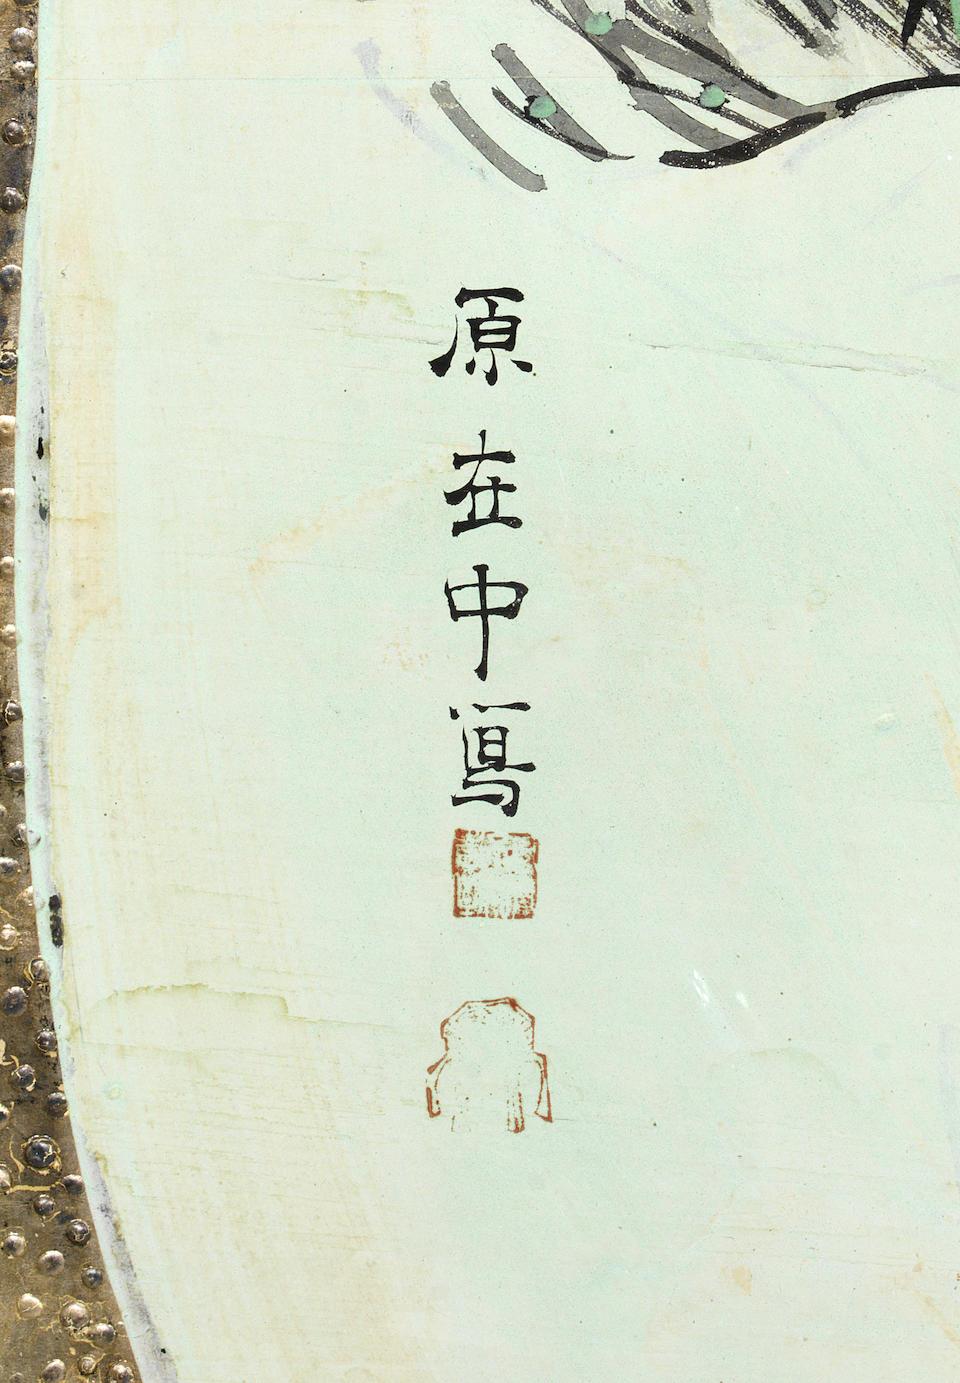 MANNER OF HARA ZAICHU (1750-1837) Edo period (1615-1868) or Meiji era (1868-1912), 19th century (2)